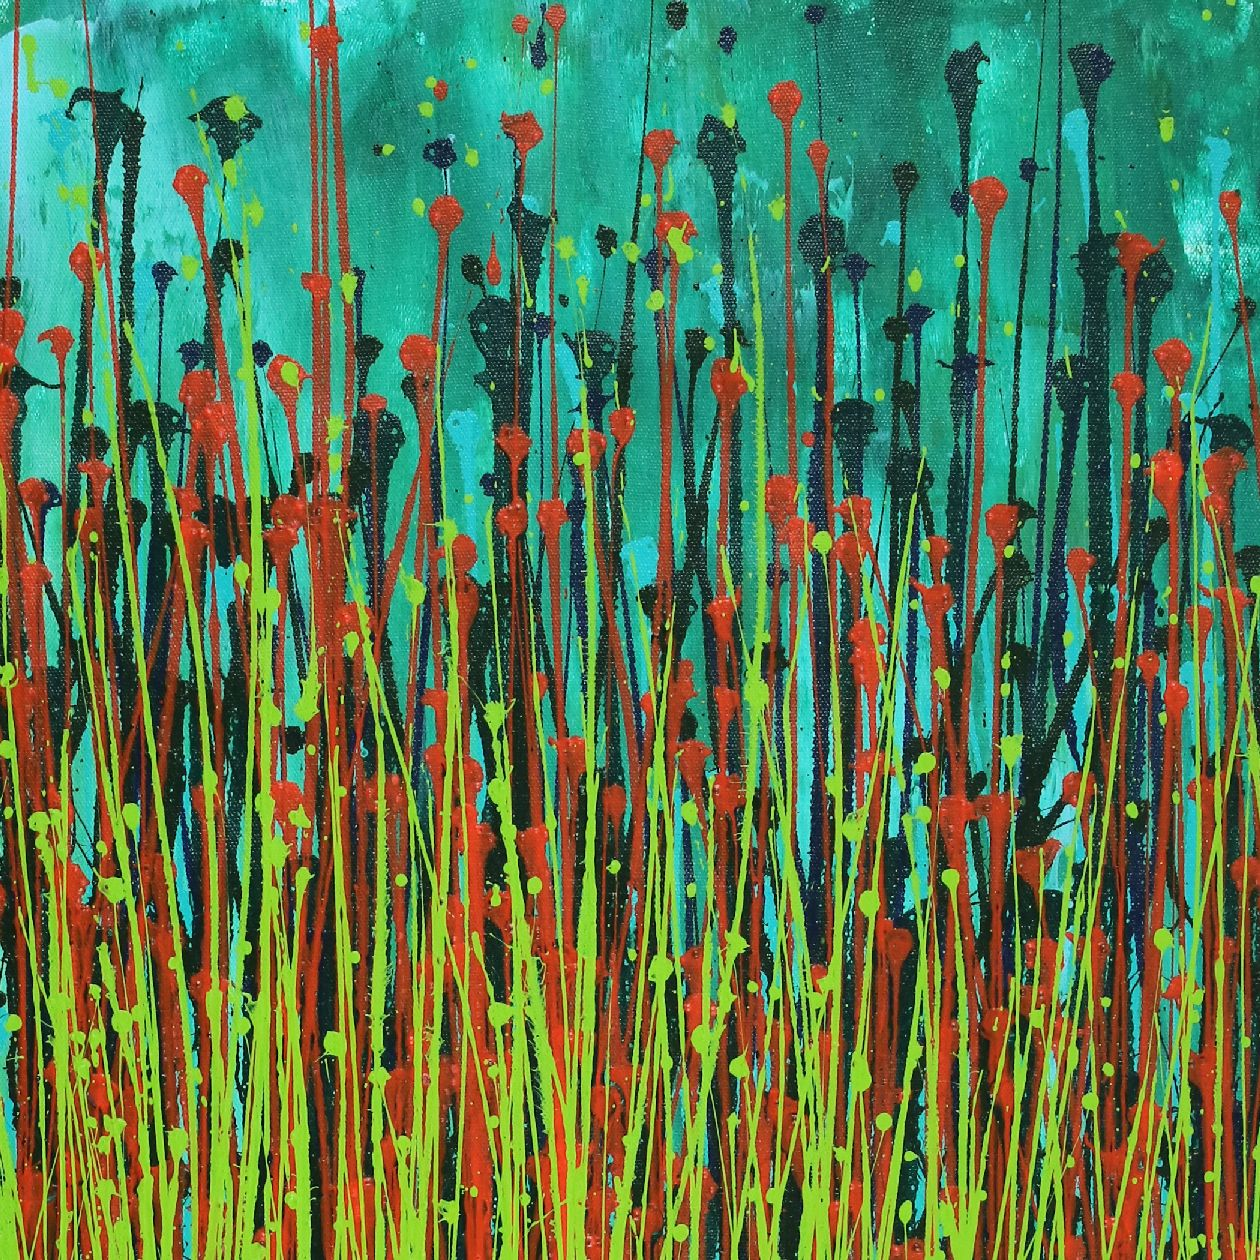 Forest Storm (Green Garden) by Nestor Toro